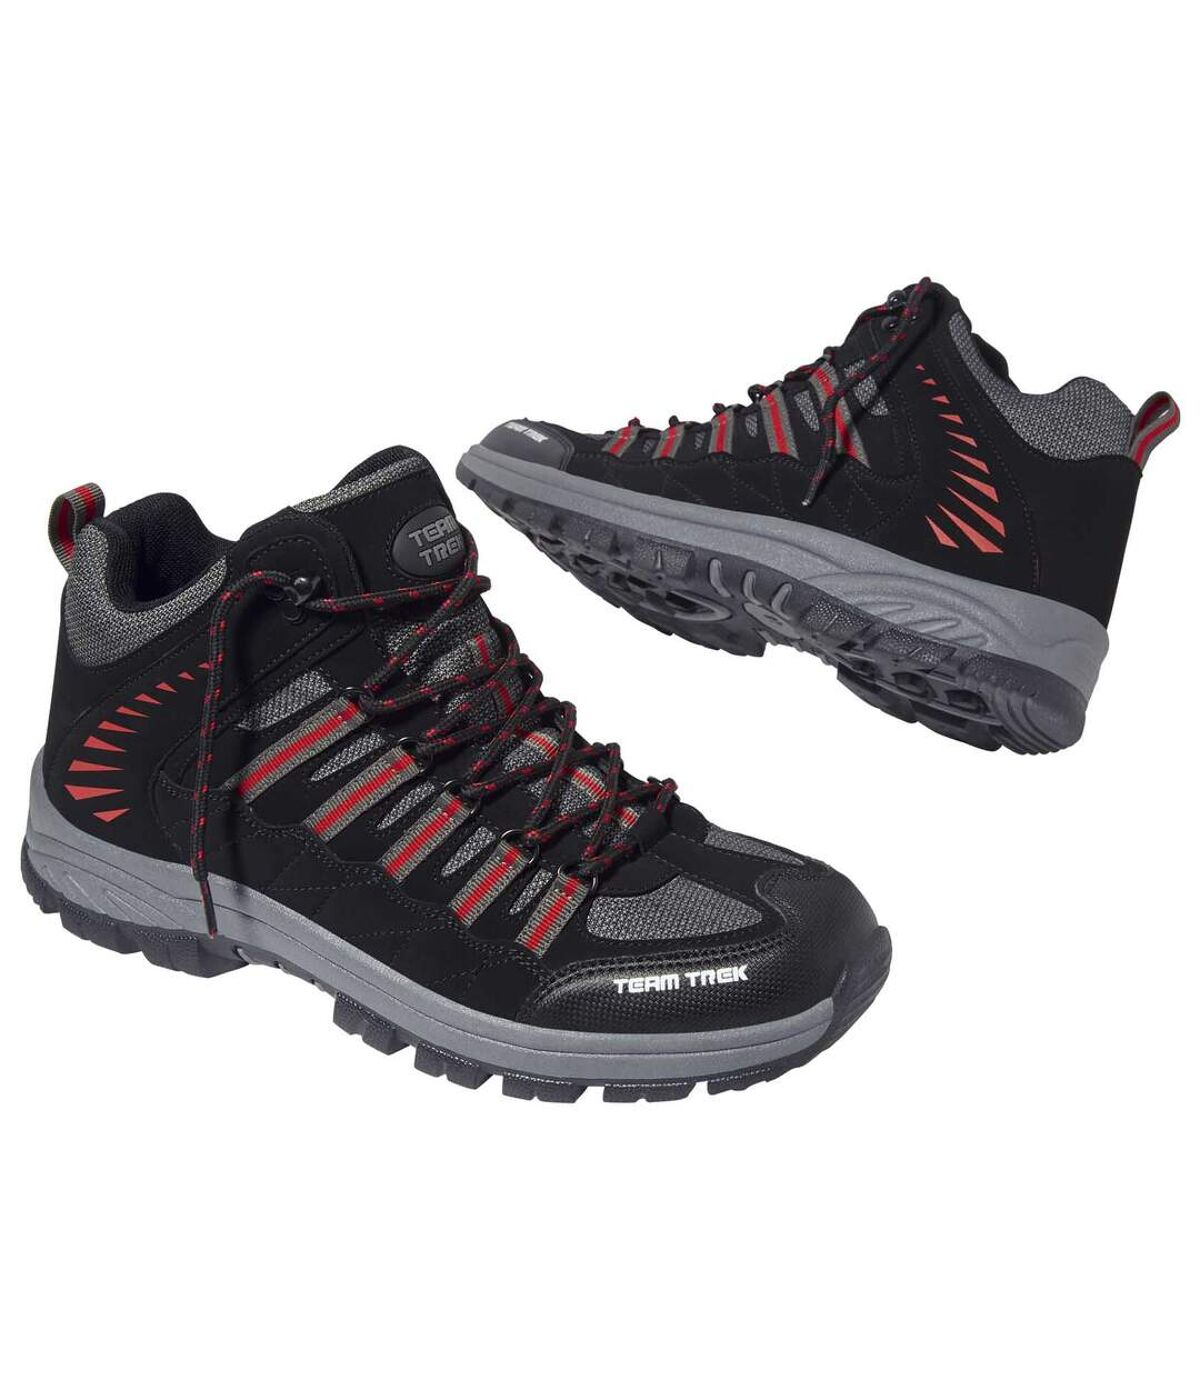 Men's Black and Grey Team Trek® Walking Shoes Atlas For Men